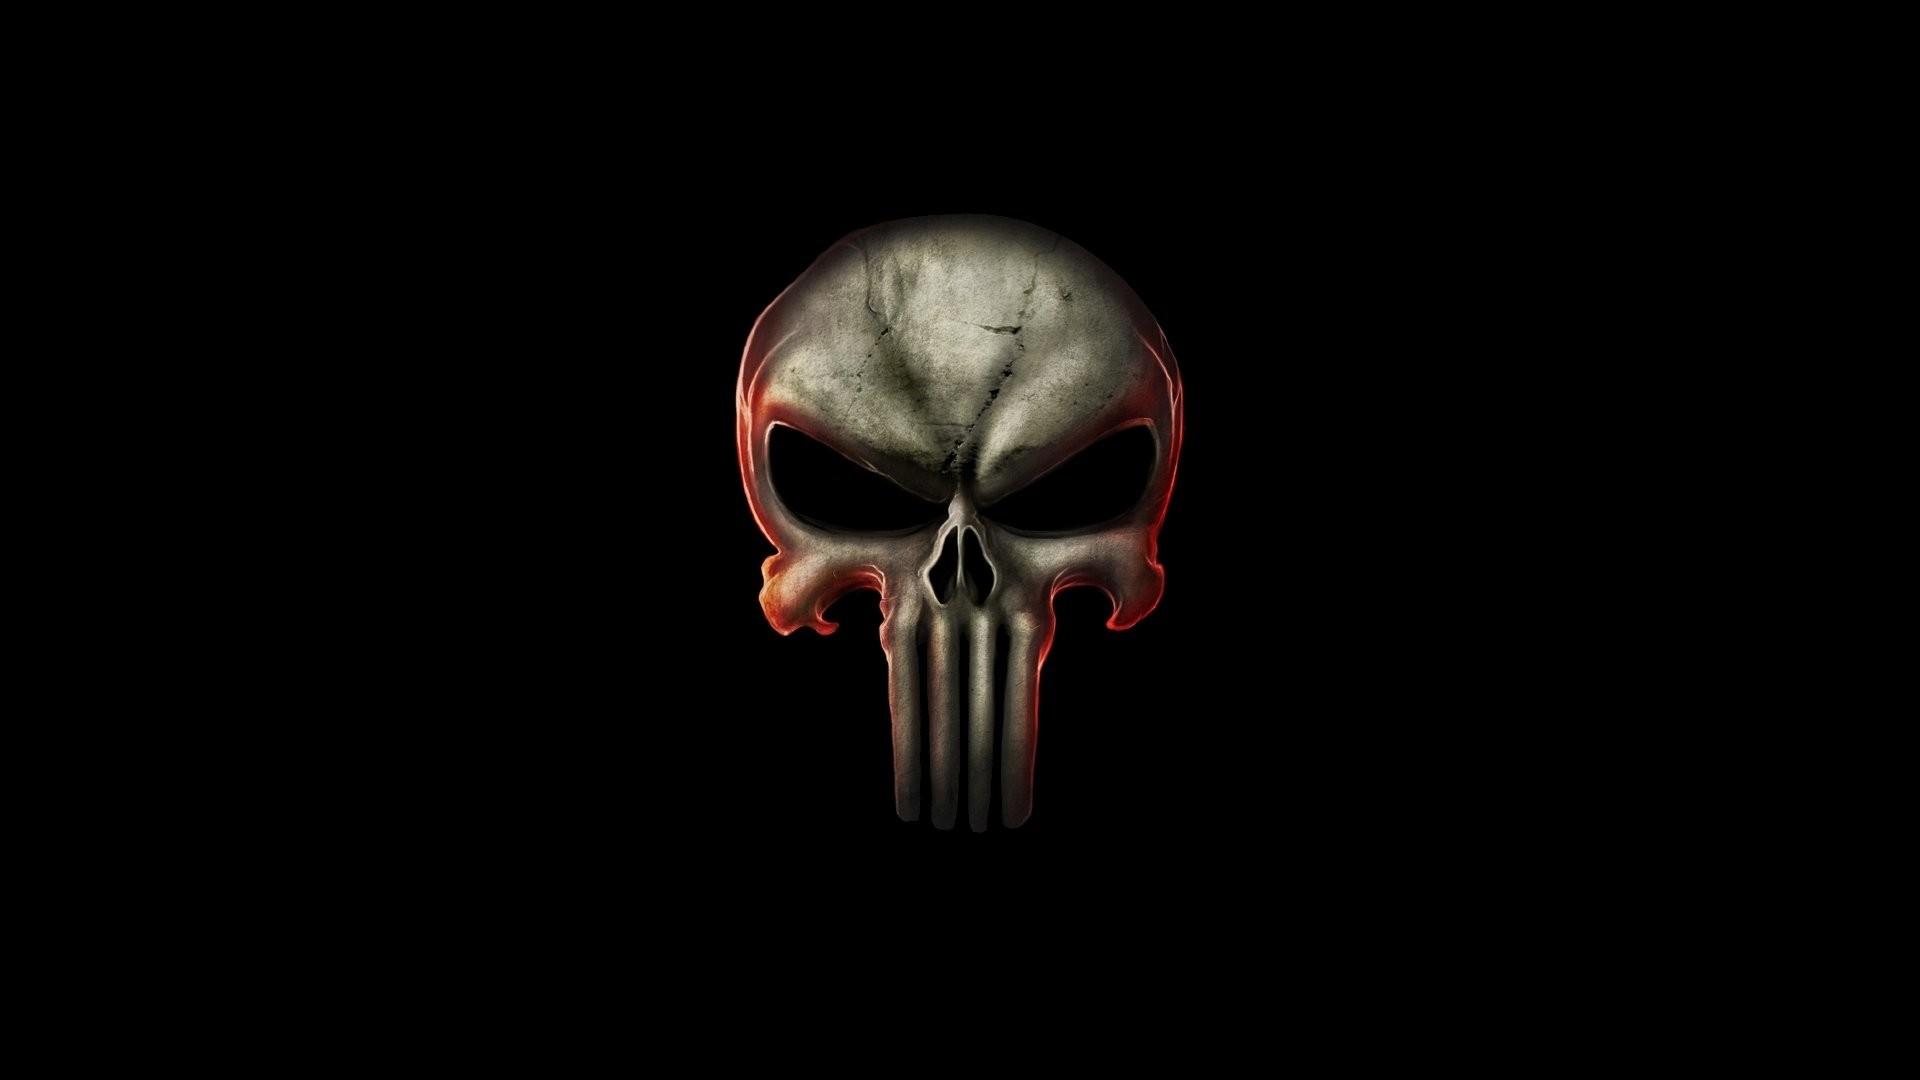 The Punisher HD Wallpapers Backgrounds Wallpaper 1280×1024 Punisher  Backgrounds (37 Wallpapers) | Adorable Wallpapers | Desktop | Pinterest |  Punisher, …